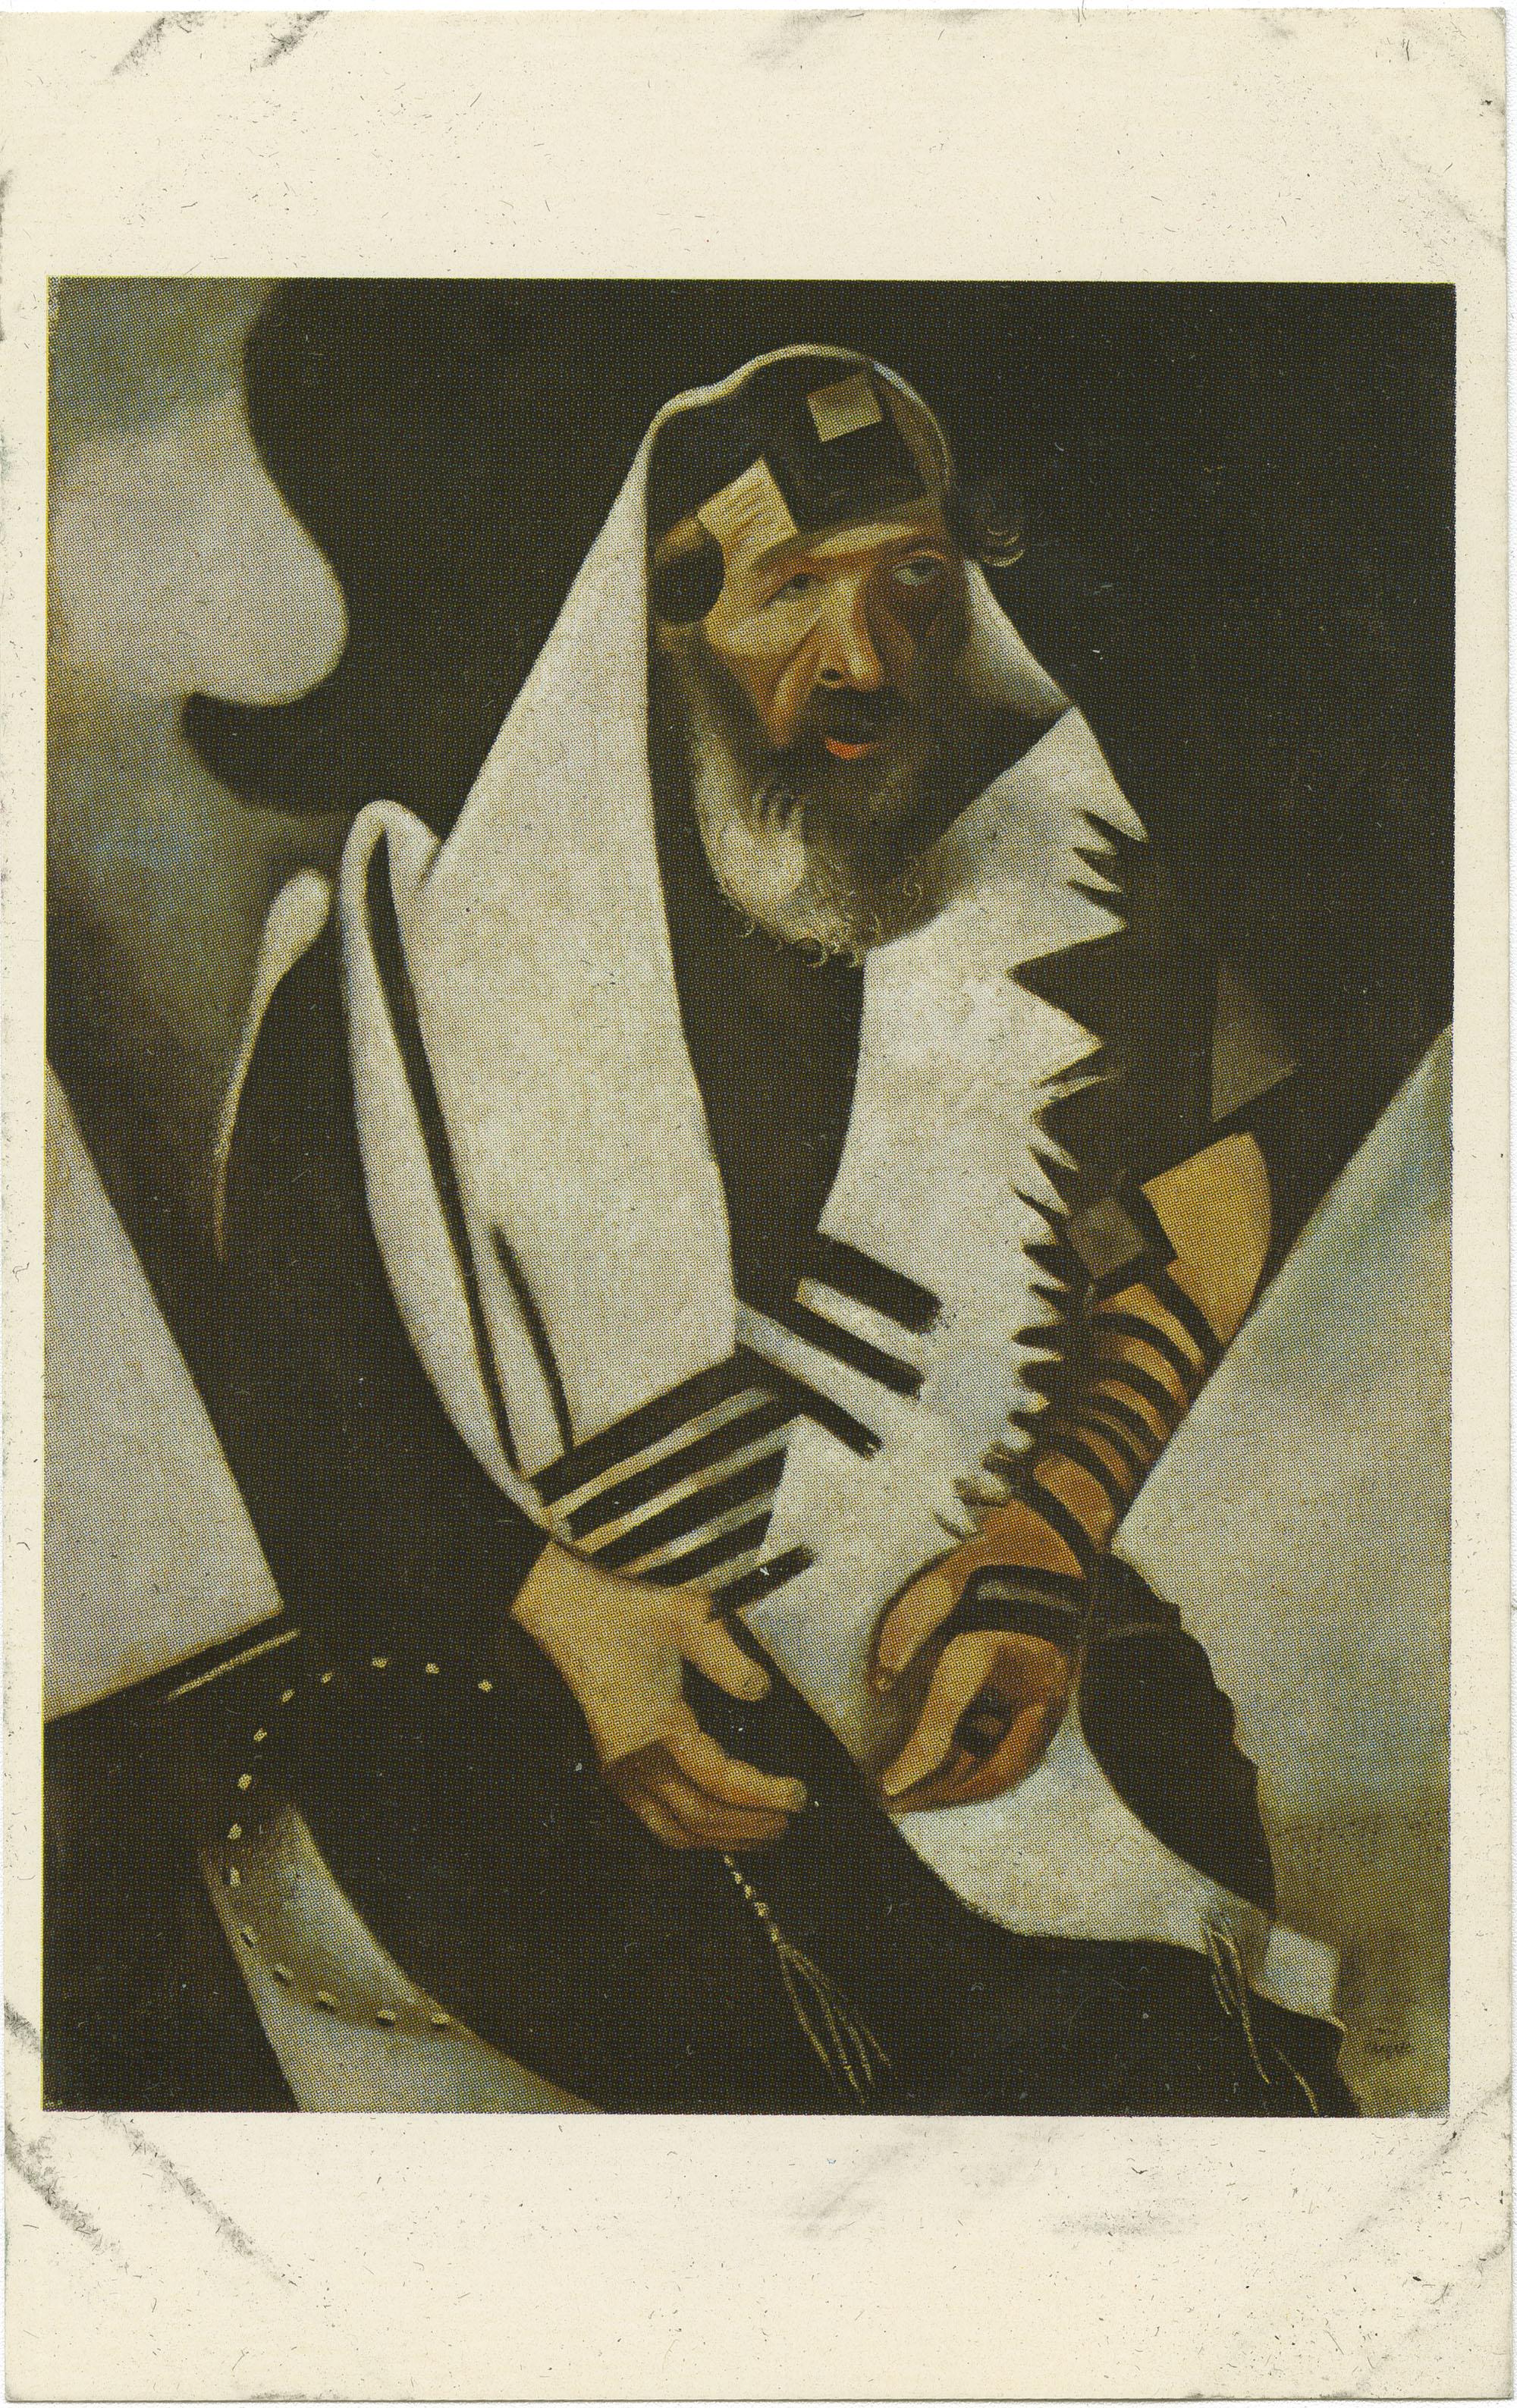 Marc Chagall. The Praying Jew (The Rabbi of Vitebsk), 1914.